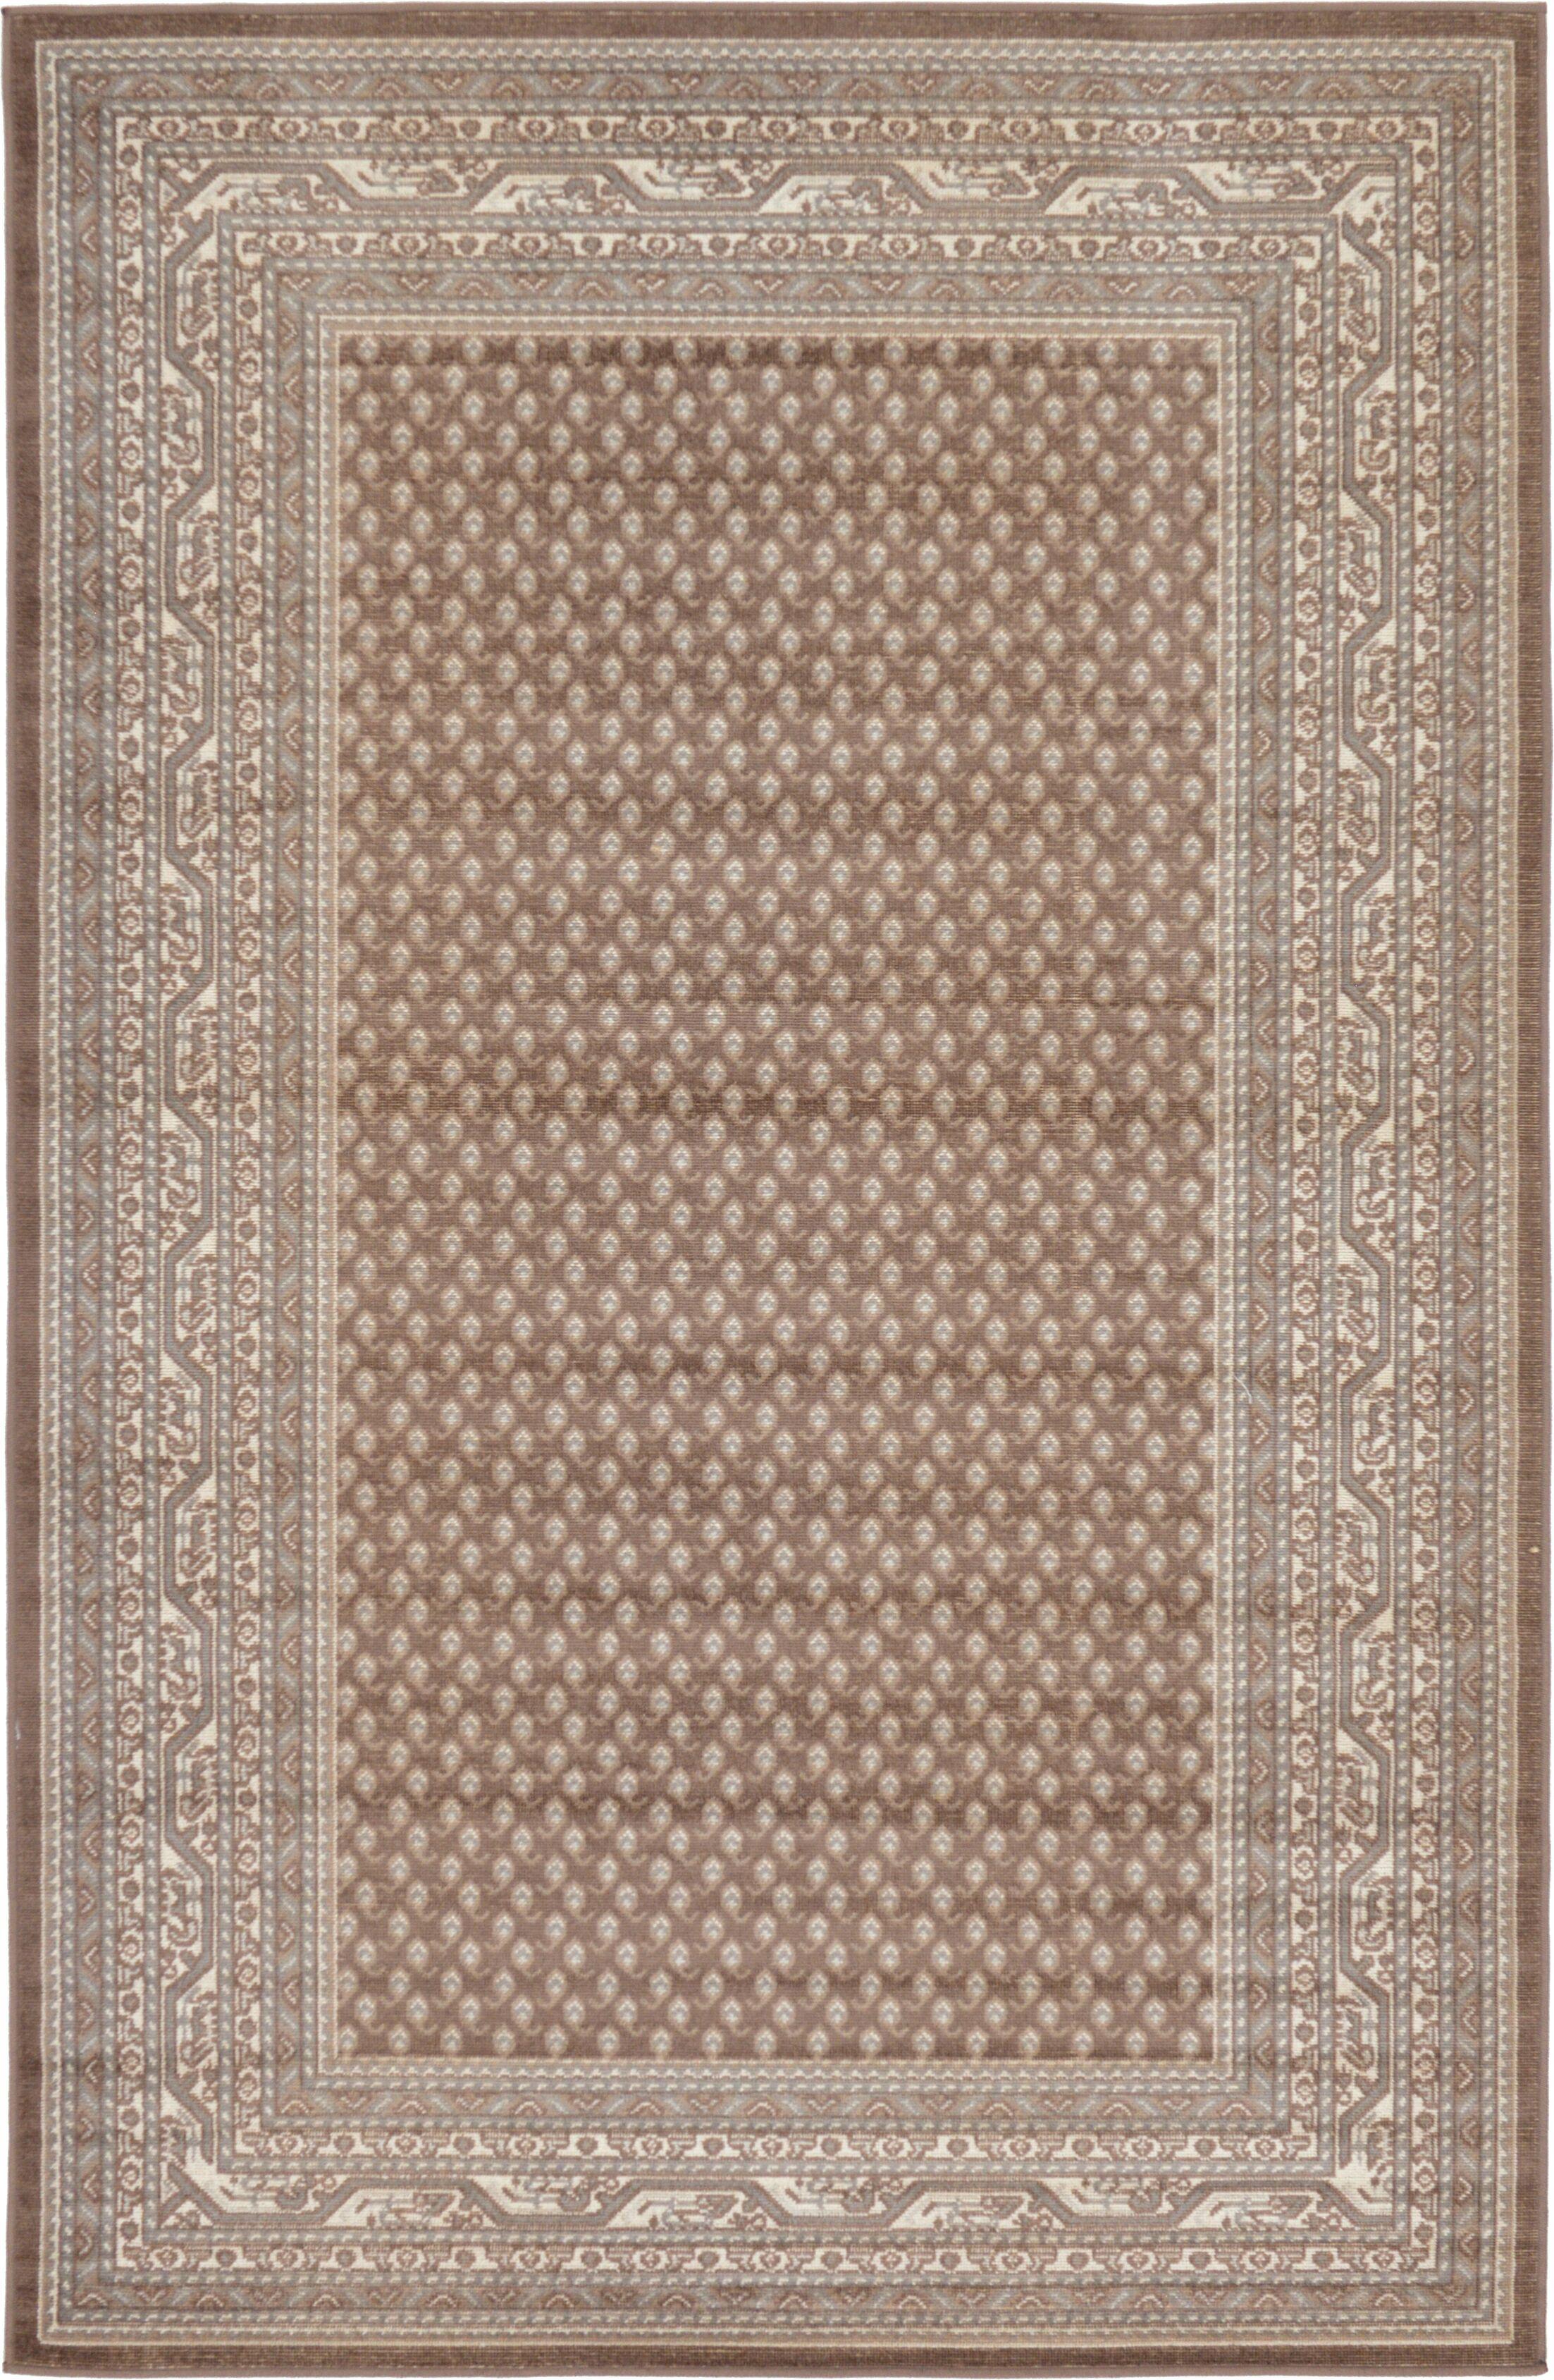 Gillam Brown Area Rug Rug Size: Rectangle 5' x 8'